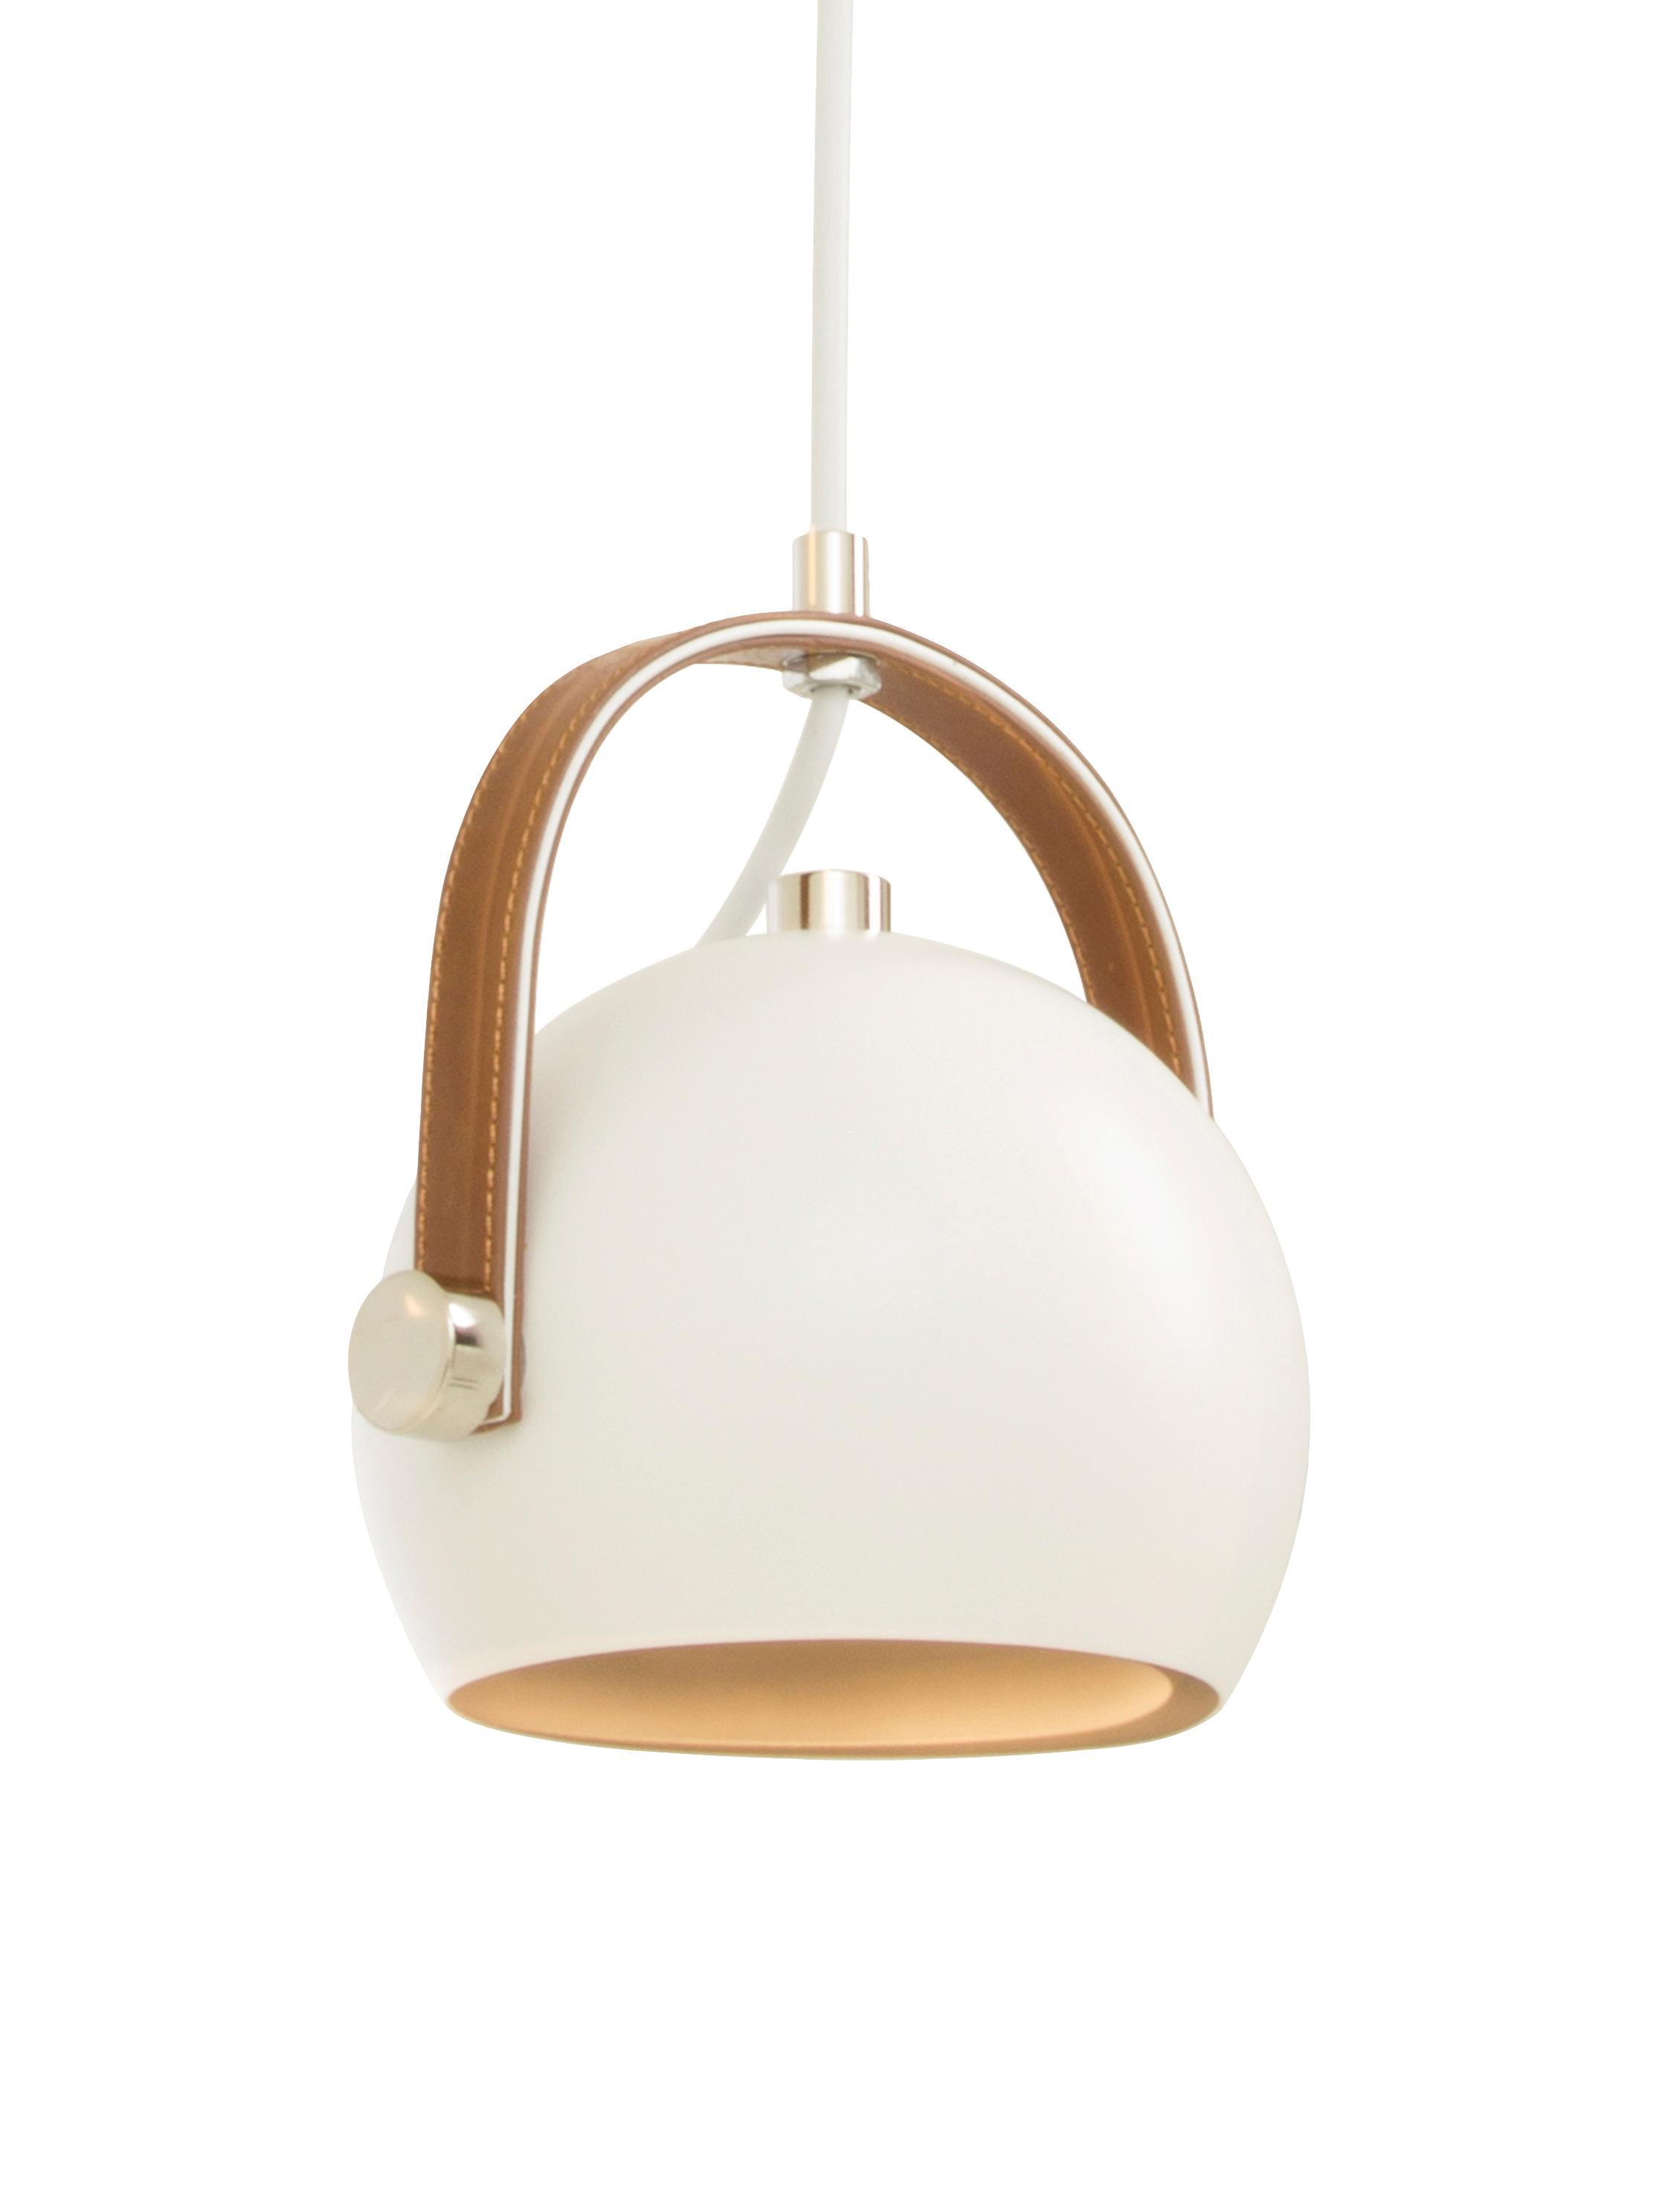 Lampada a sospensione regolabile Bow, Bianco, Larg. 19 x Alt. 20 cm